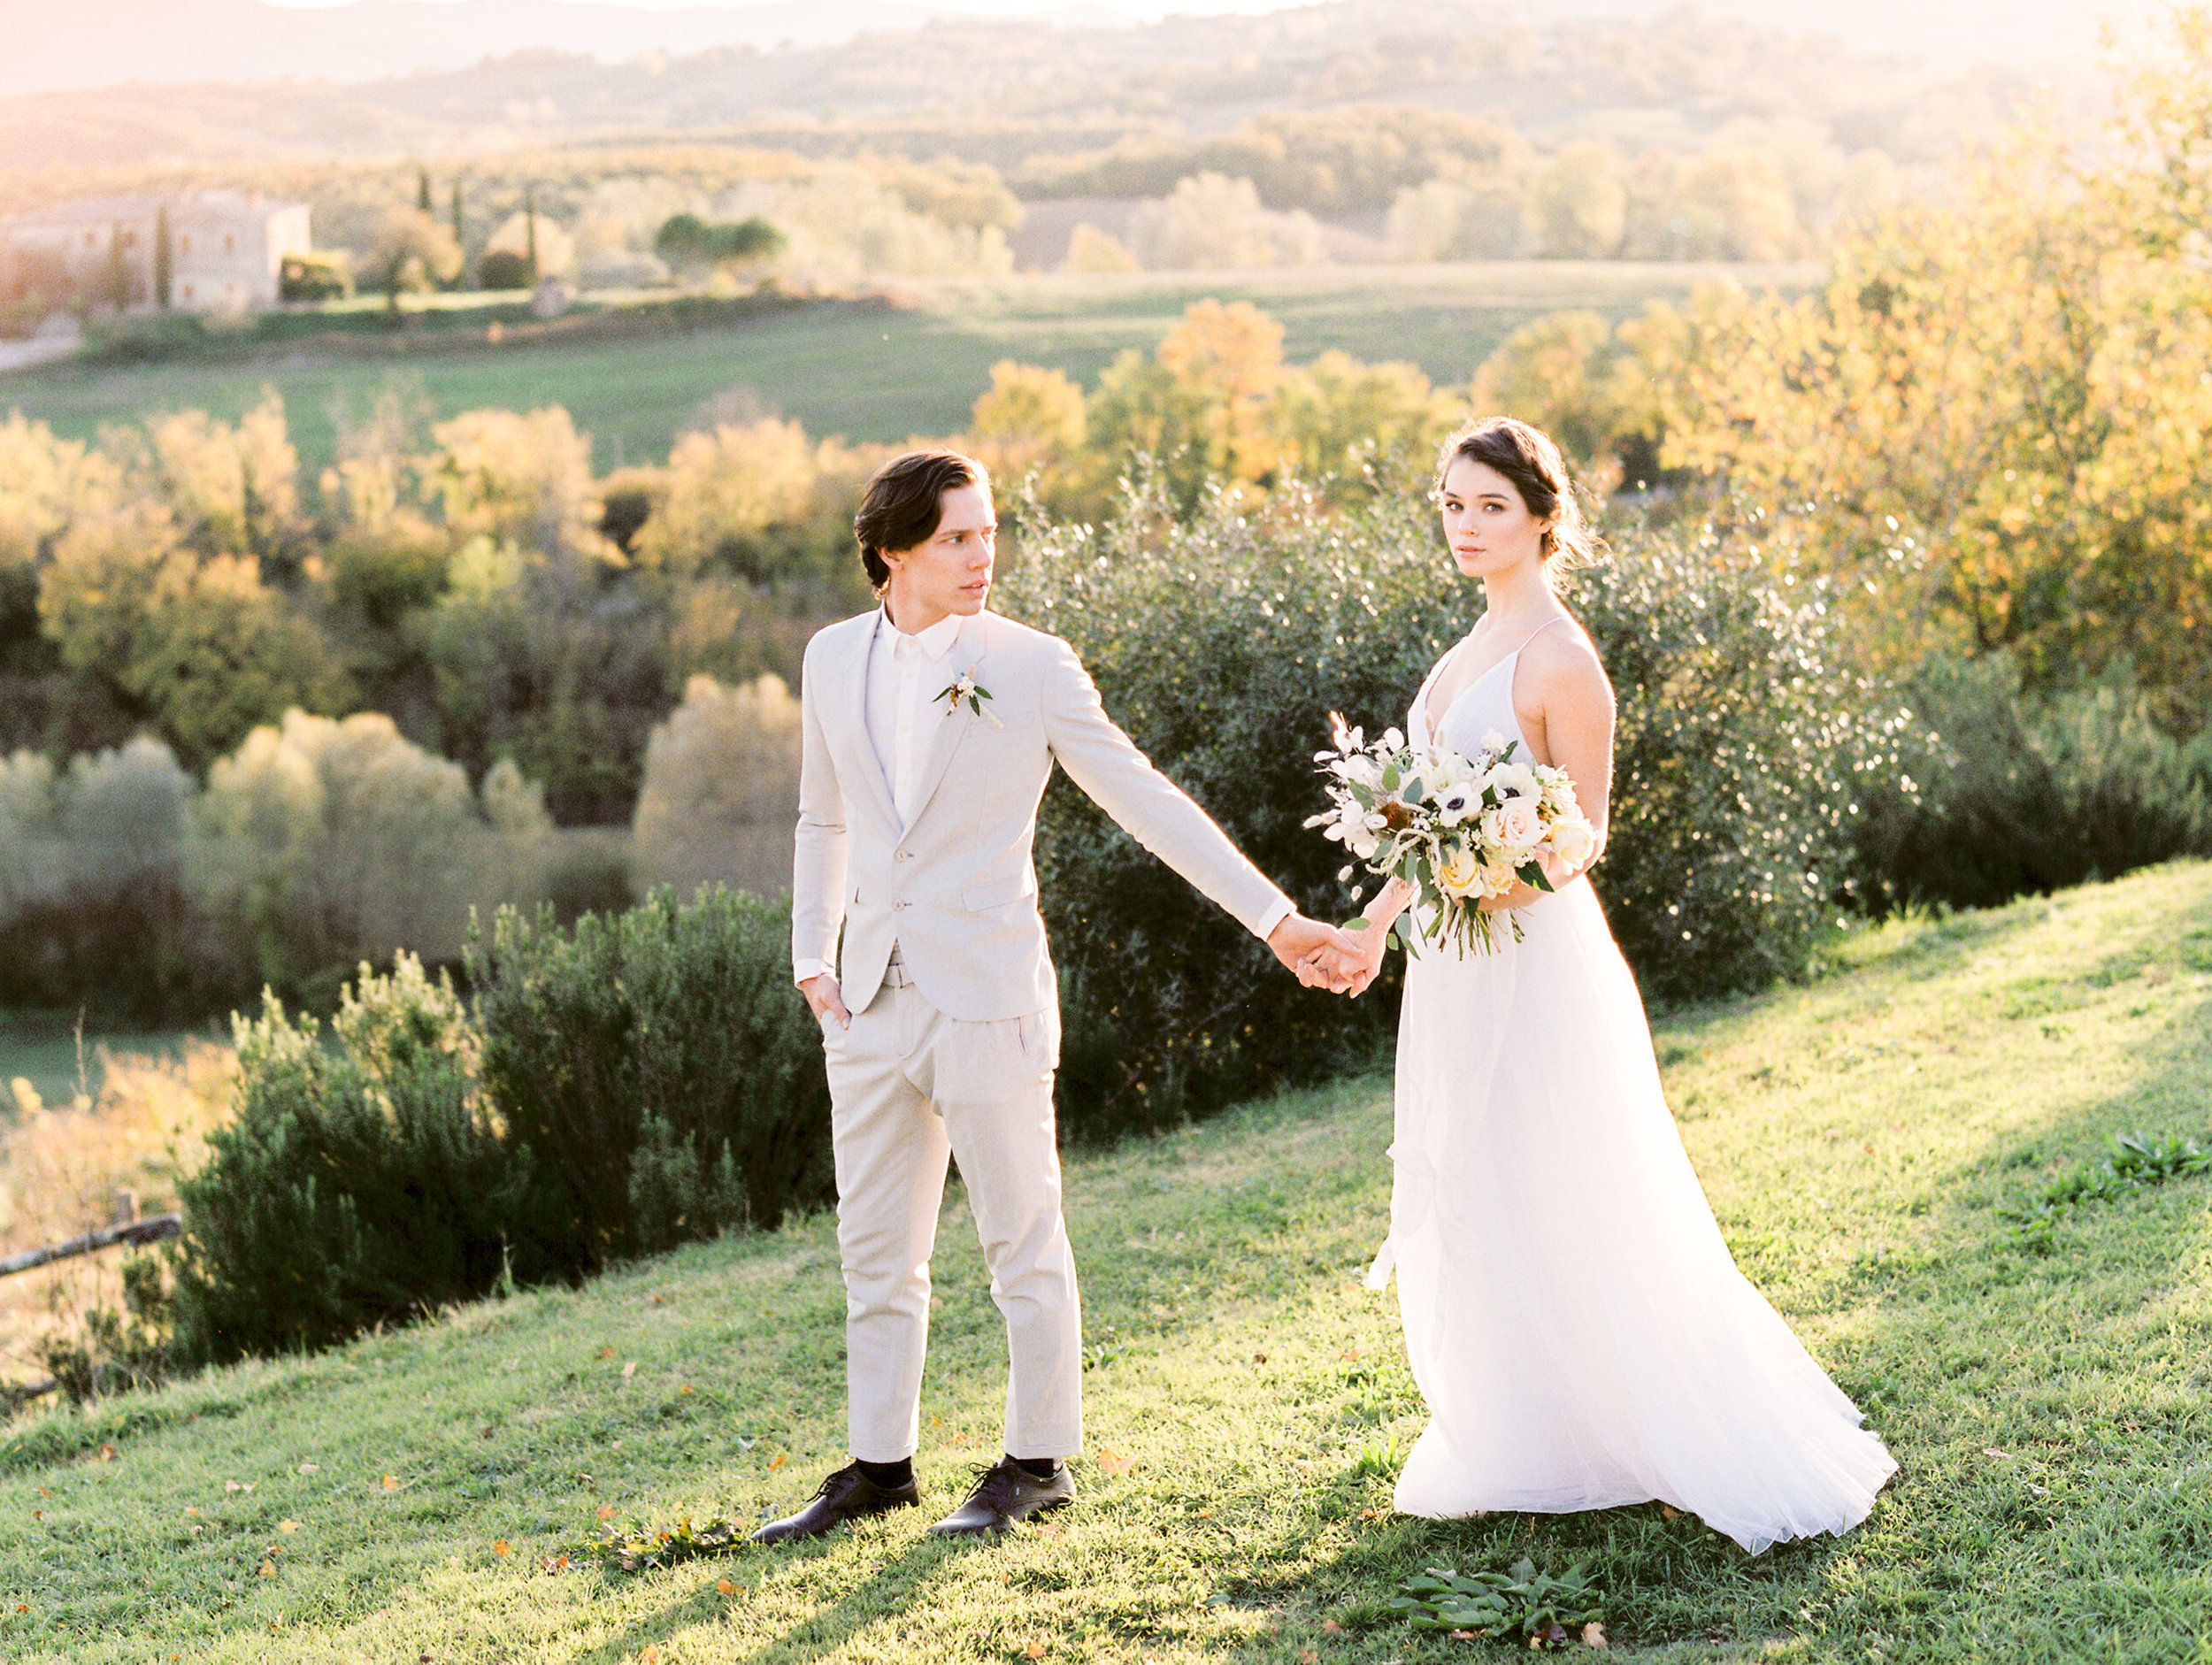 romantic-italy-wedding-in-tuscany-127.jpg